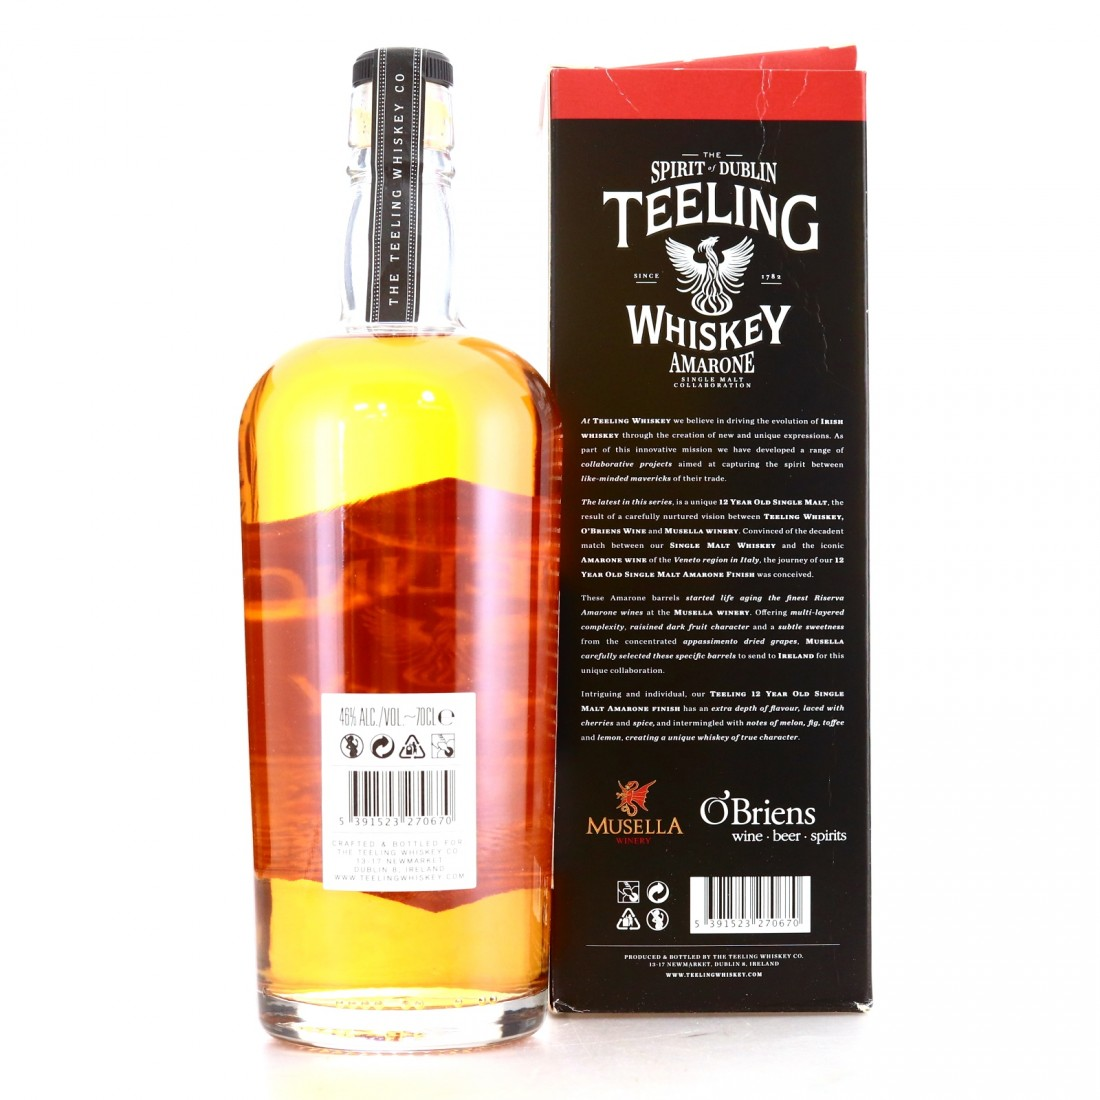 Teeling 12 Year Old / Musella Winery Amarone Cask Finish